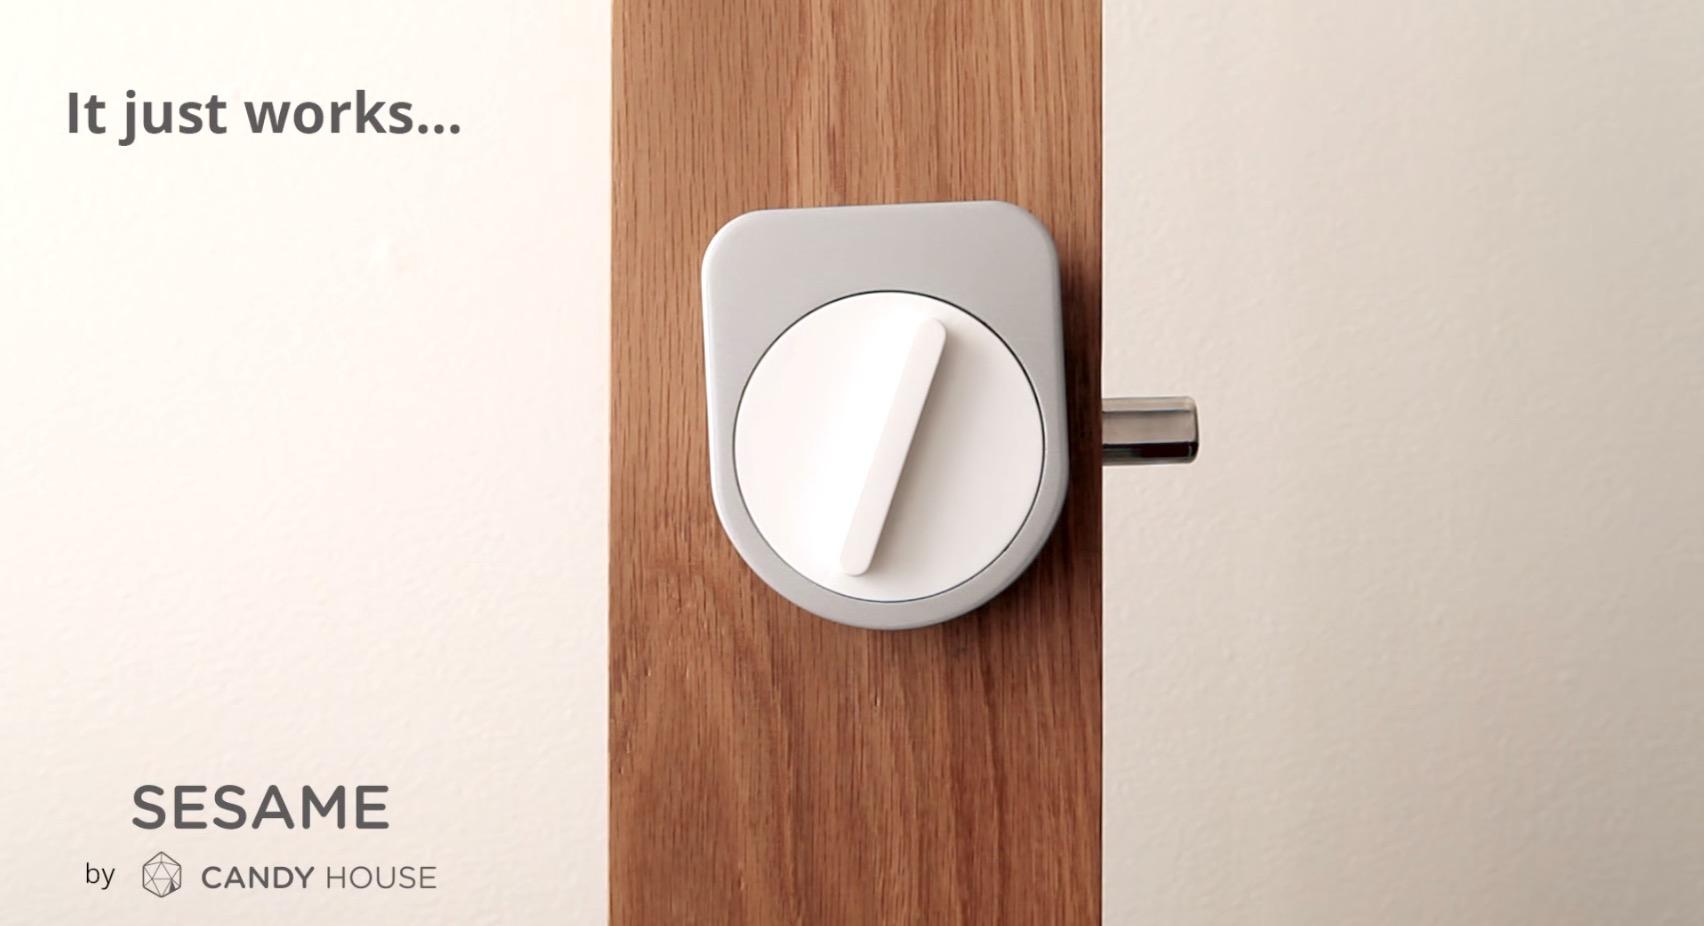 Sesame อุปกรณ์ช่วยคุณ ล็อค ปลดล็อค ประตูผ่าน Smartphone